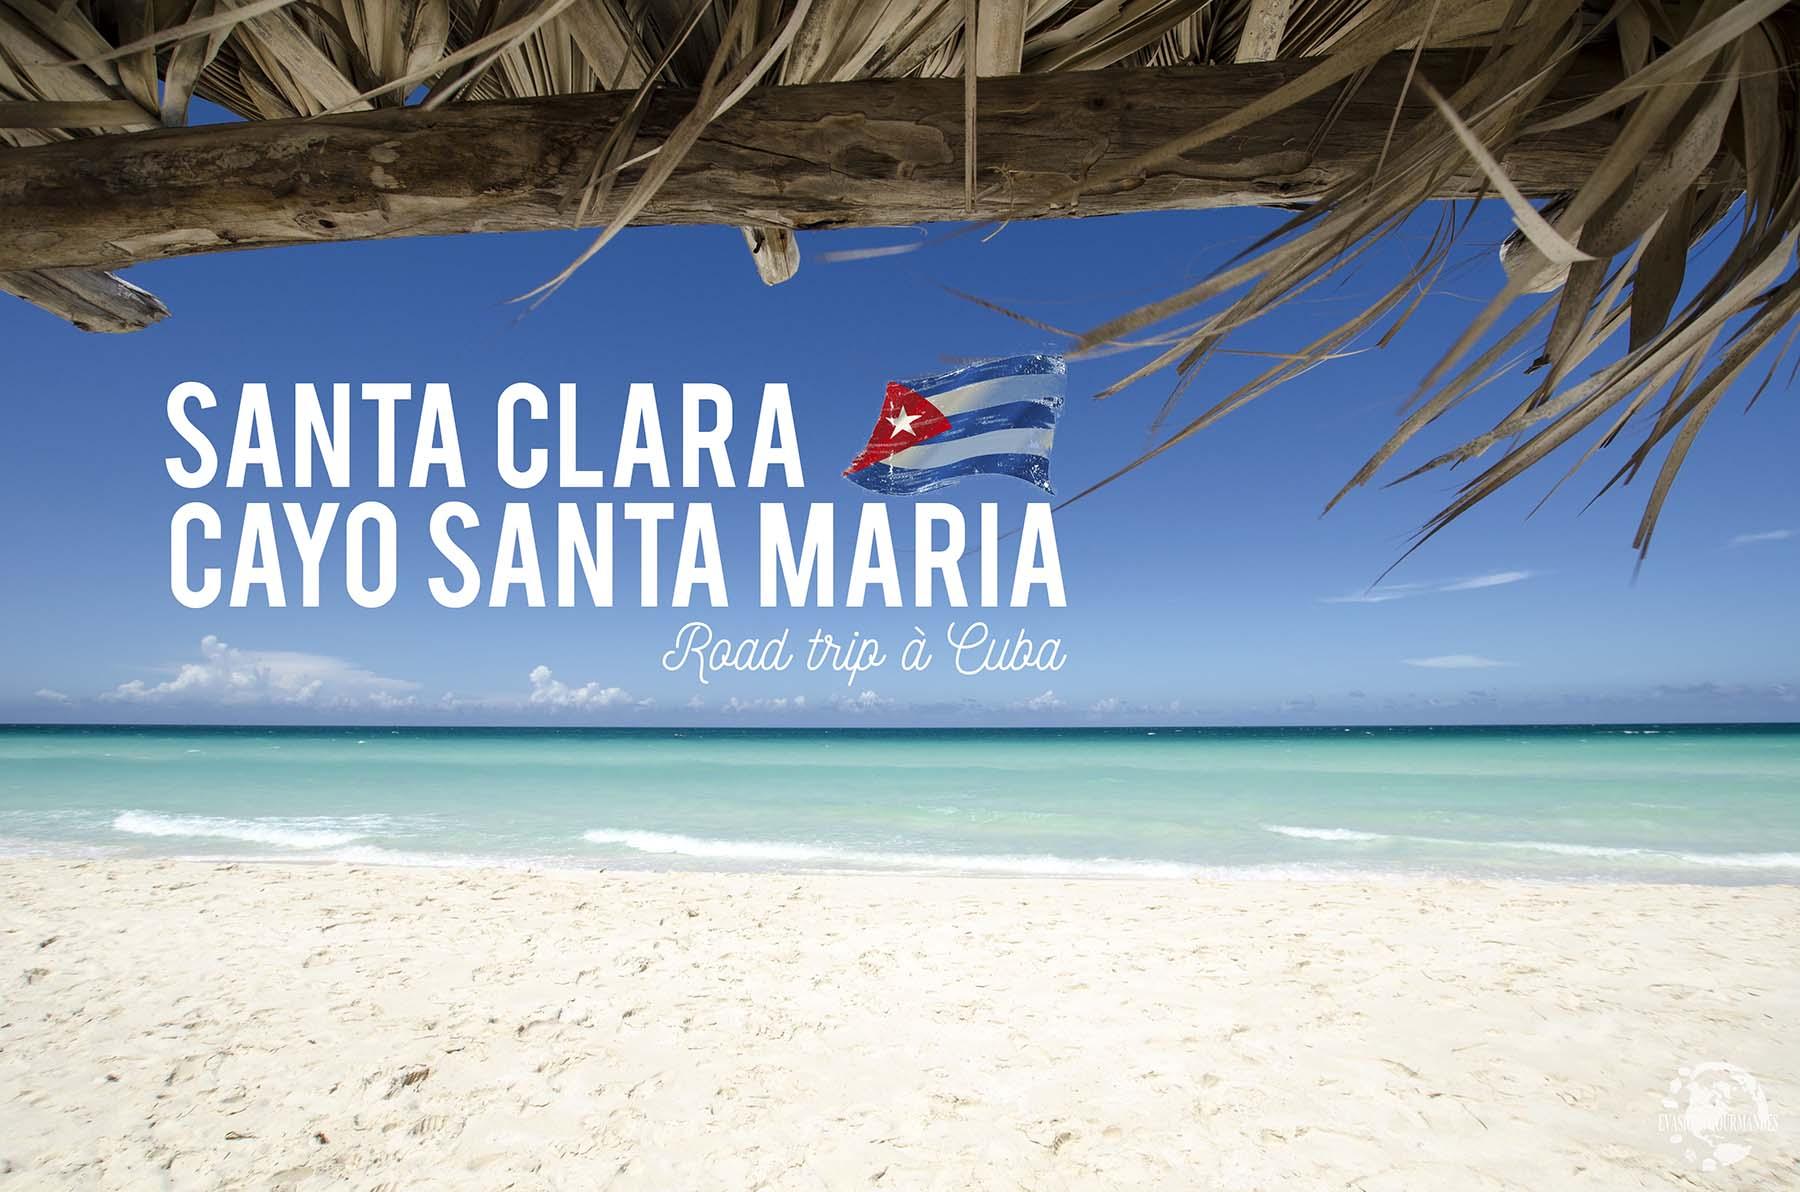 Santa Clara et Cayo Santa Maria